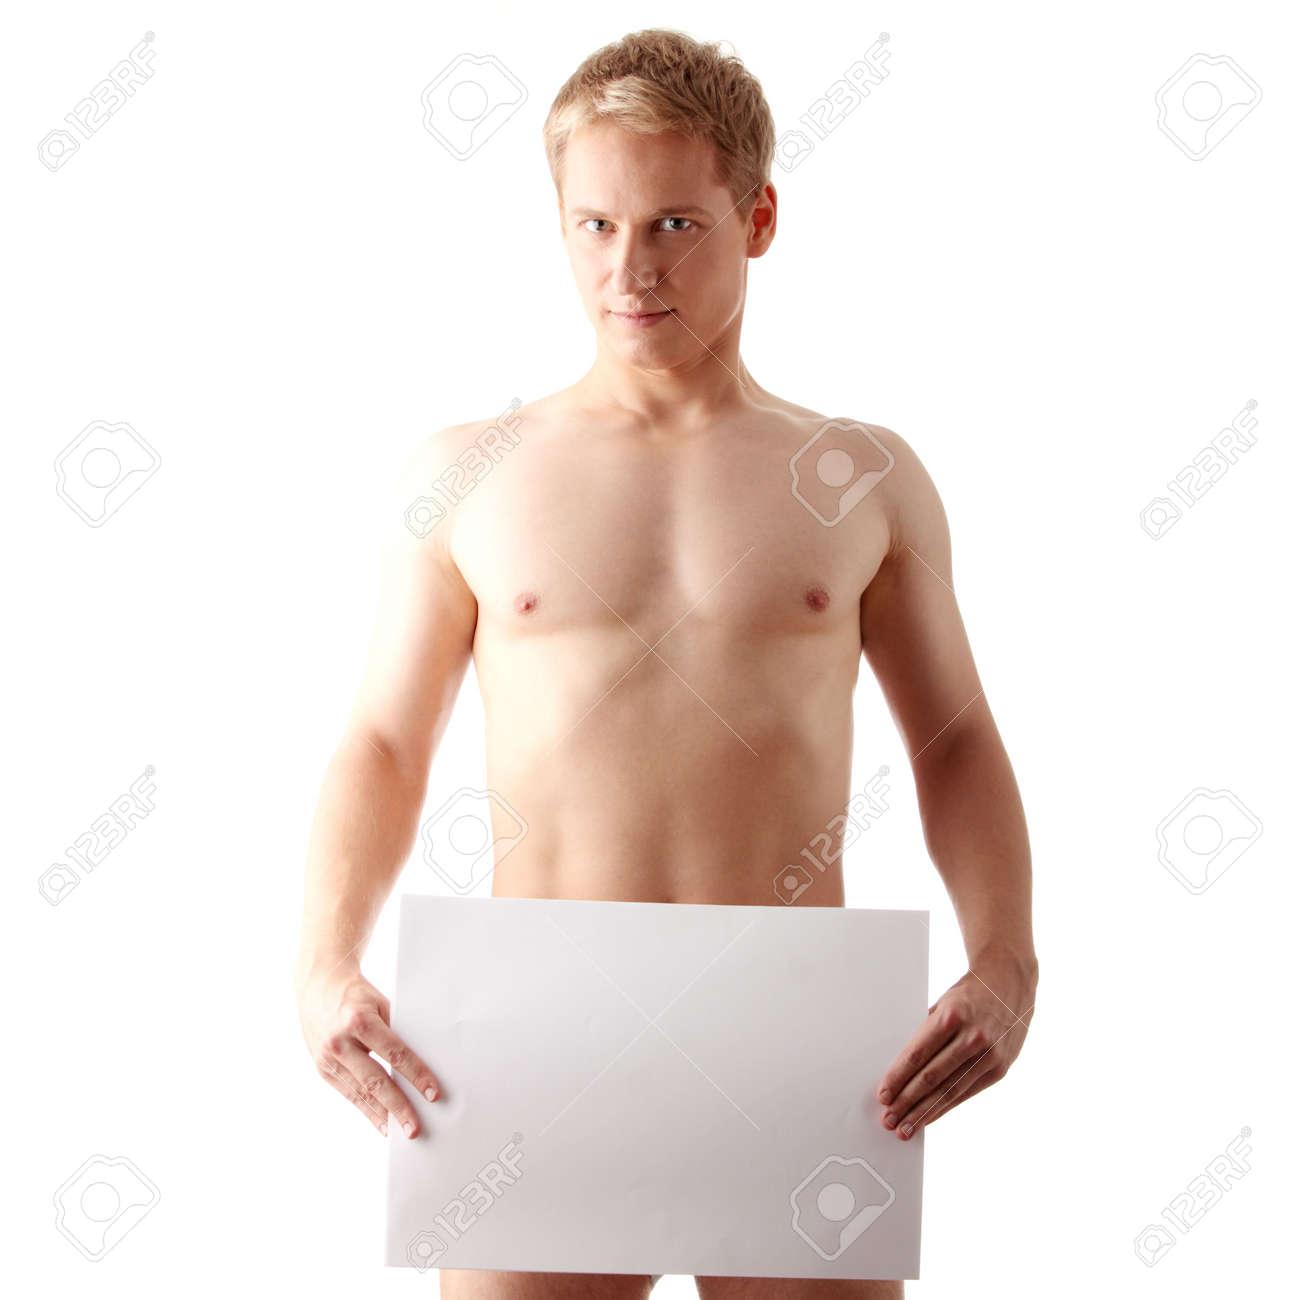 Nude man pics foto 79